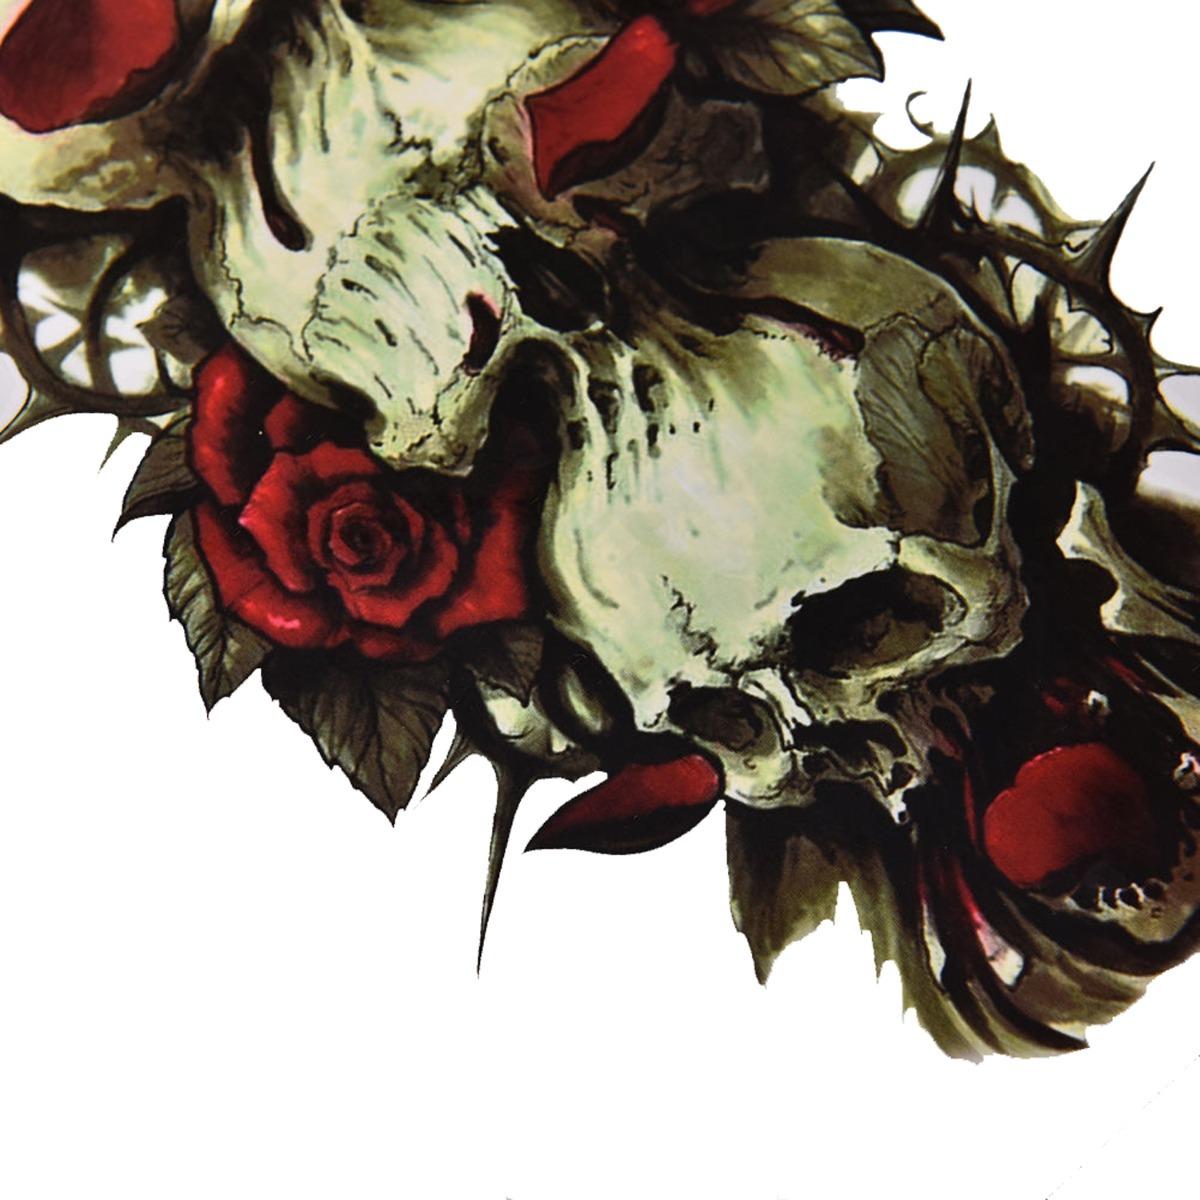 Tatuagem Temporaria Impermeavel Rosas Caveiras Tam Grande R